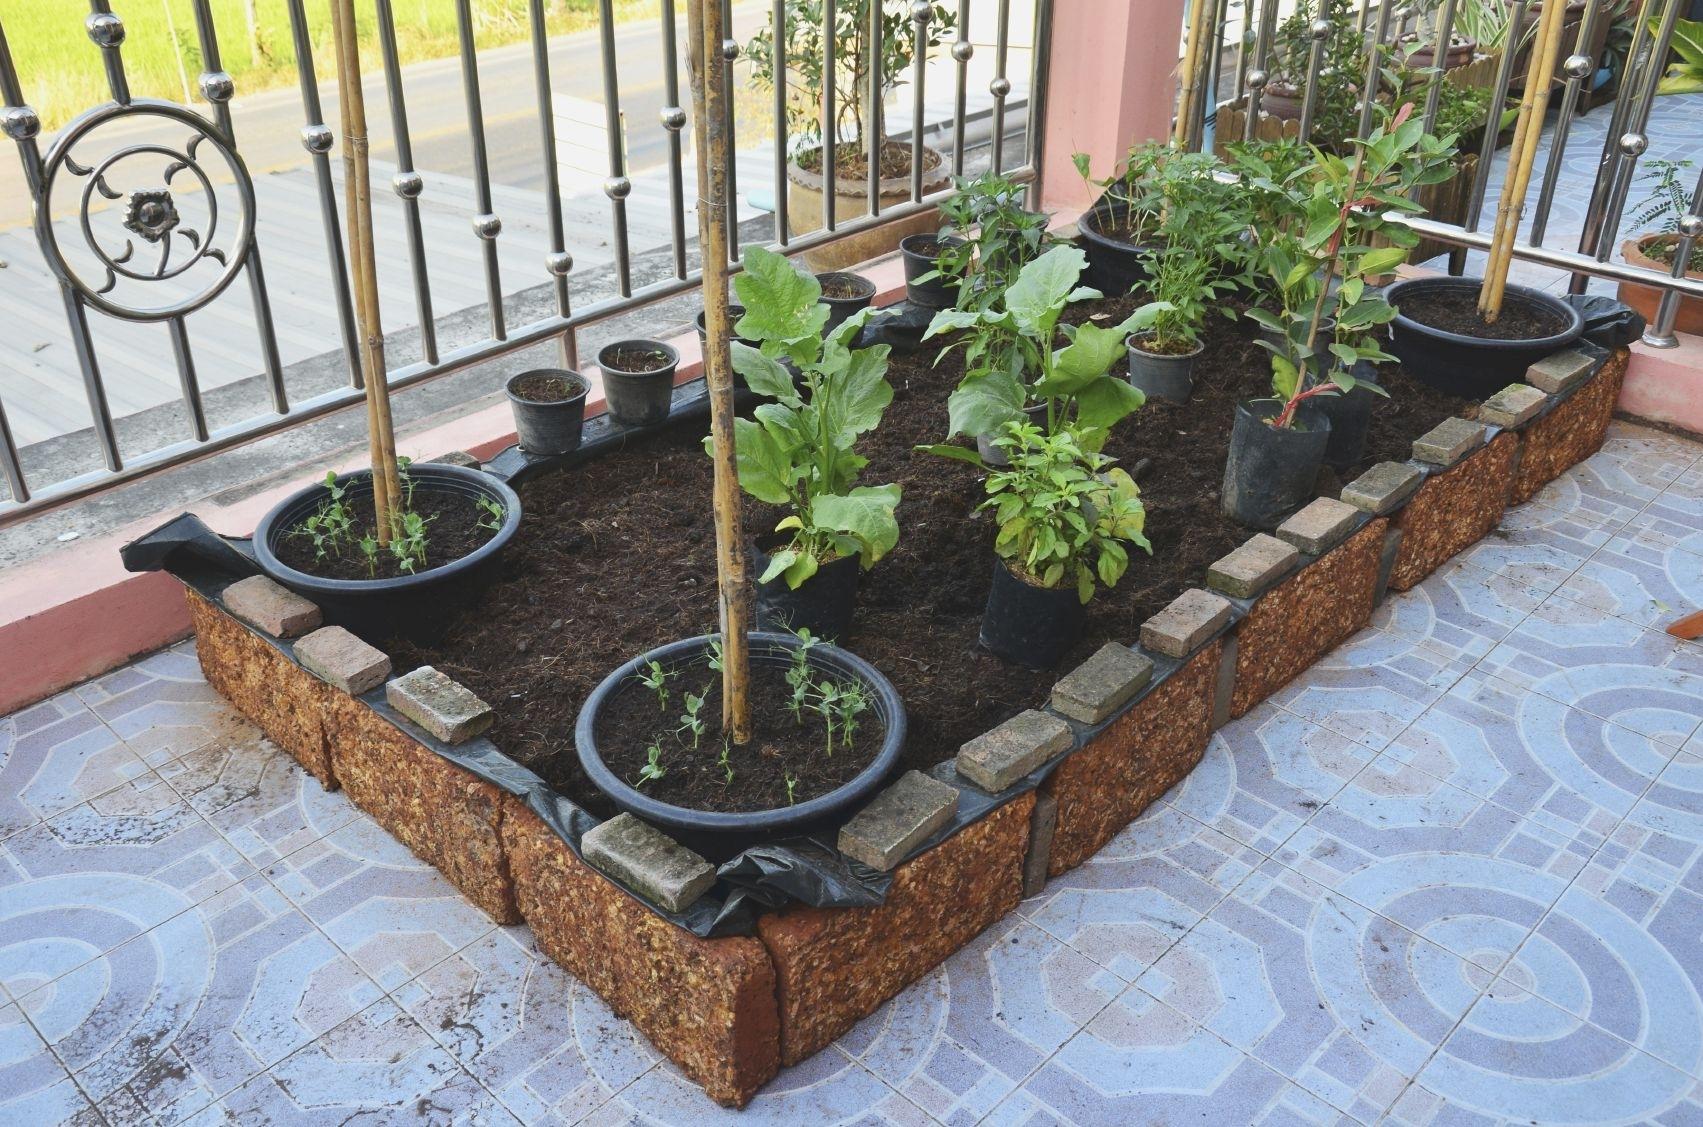 starting an urban vegetable garden photo - 2